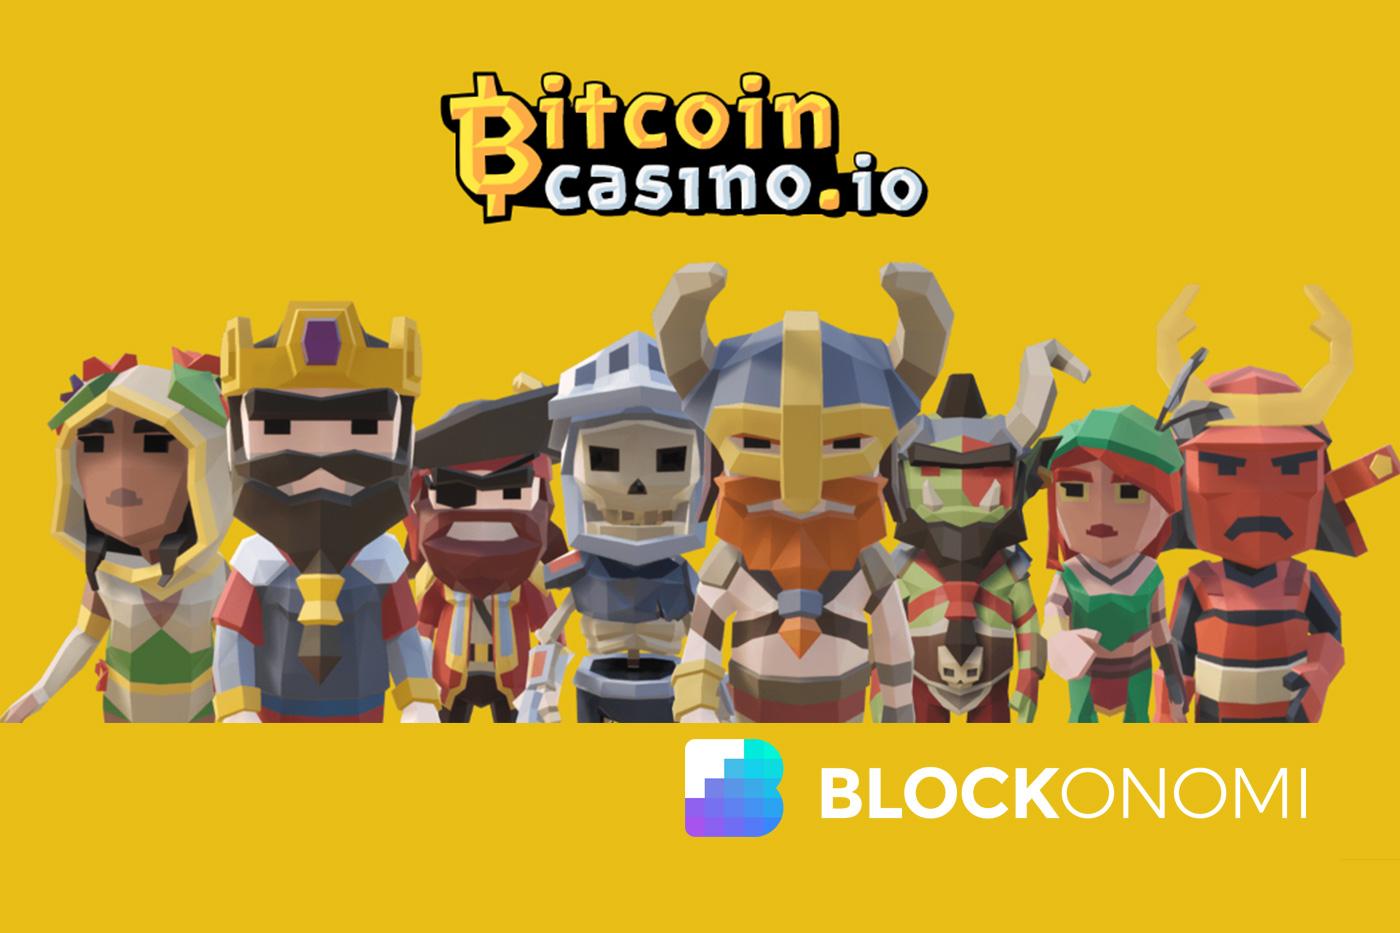 Crypto bitcoin คาสิโนพร้อม faucet